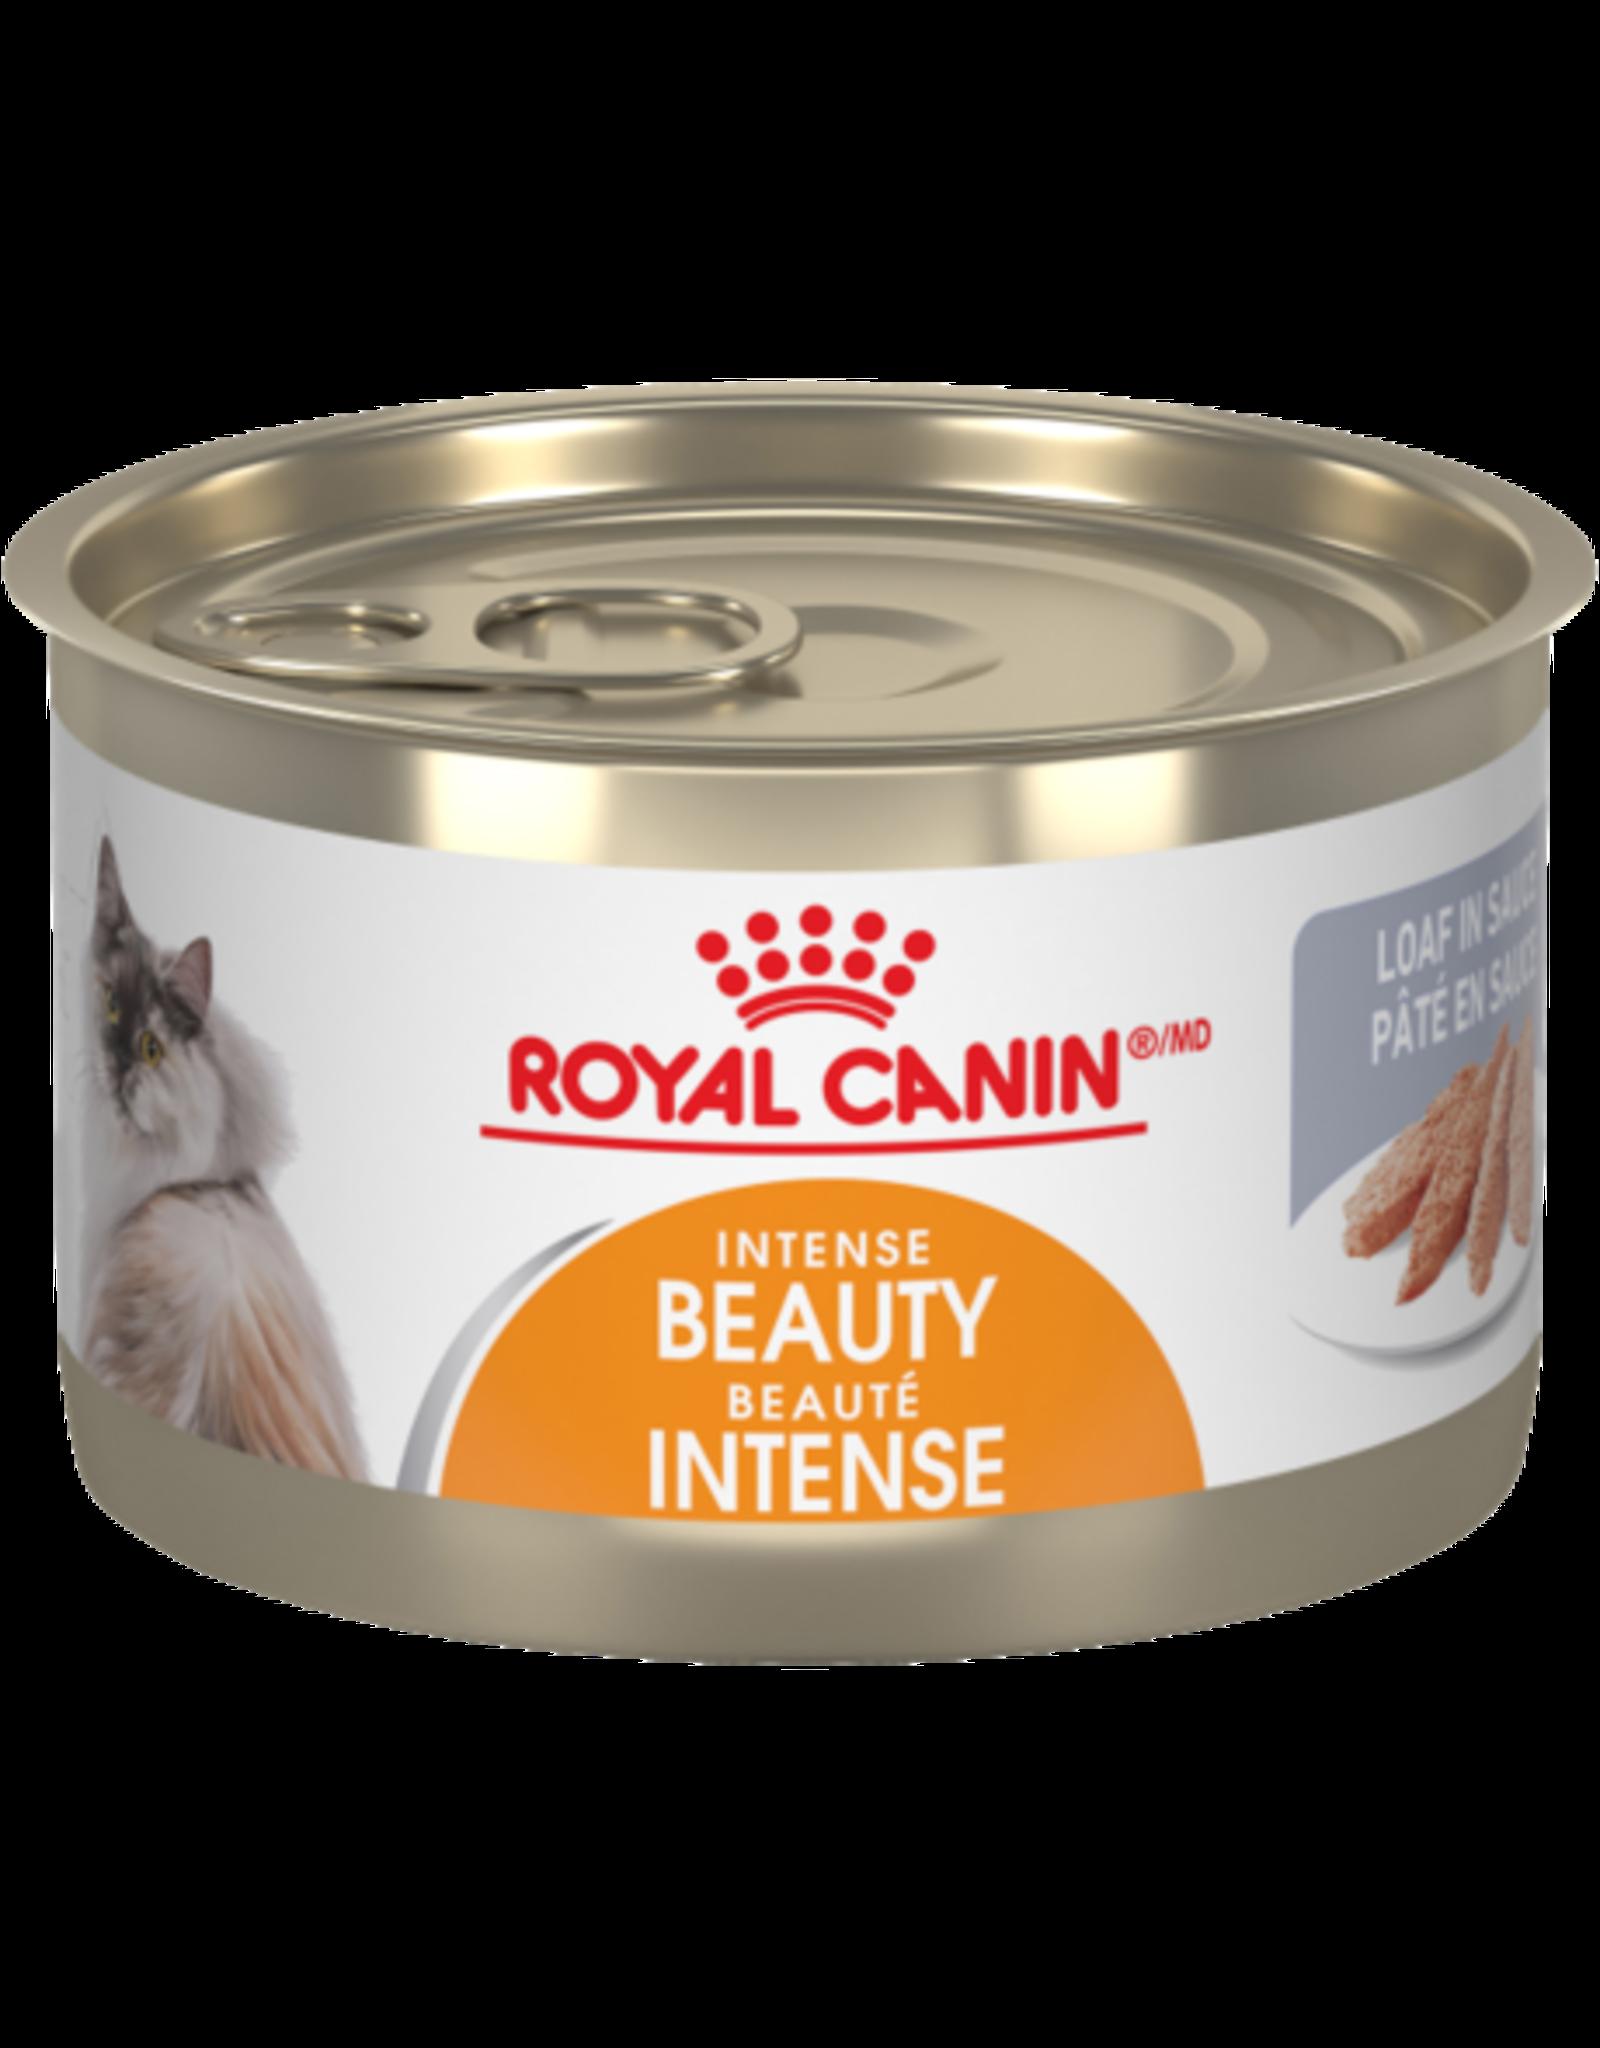 Royal Canin Royal Canin - Intense Beauty Loaf